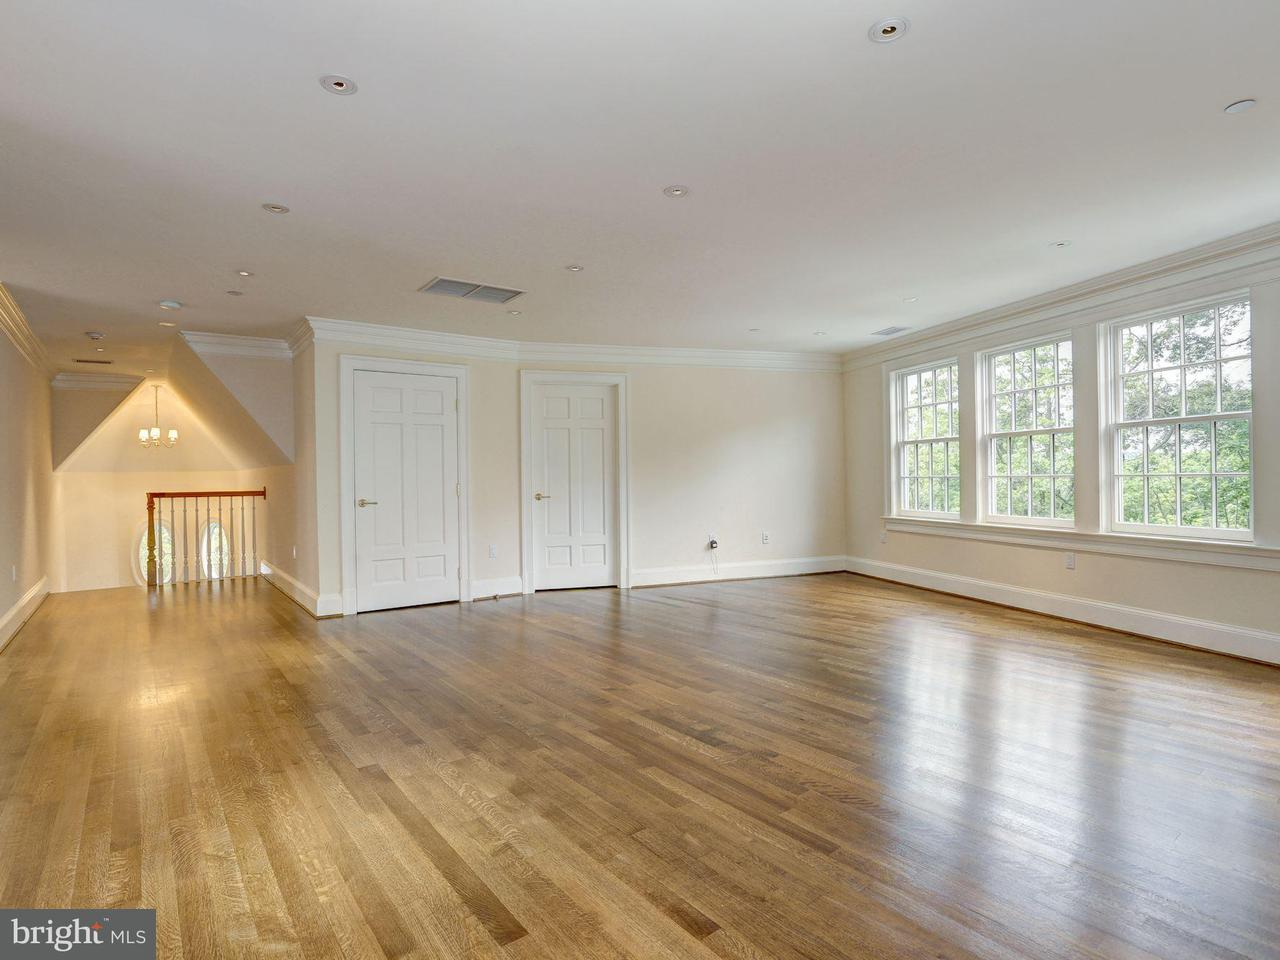 Additional photo for property listing at 2806 UNIVERSITY TER NW 2806 UNIVERSITY TER NW Washington, 哥倫比亞特區 20016 美國